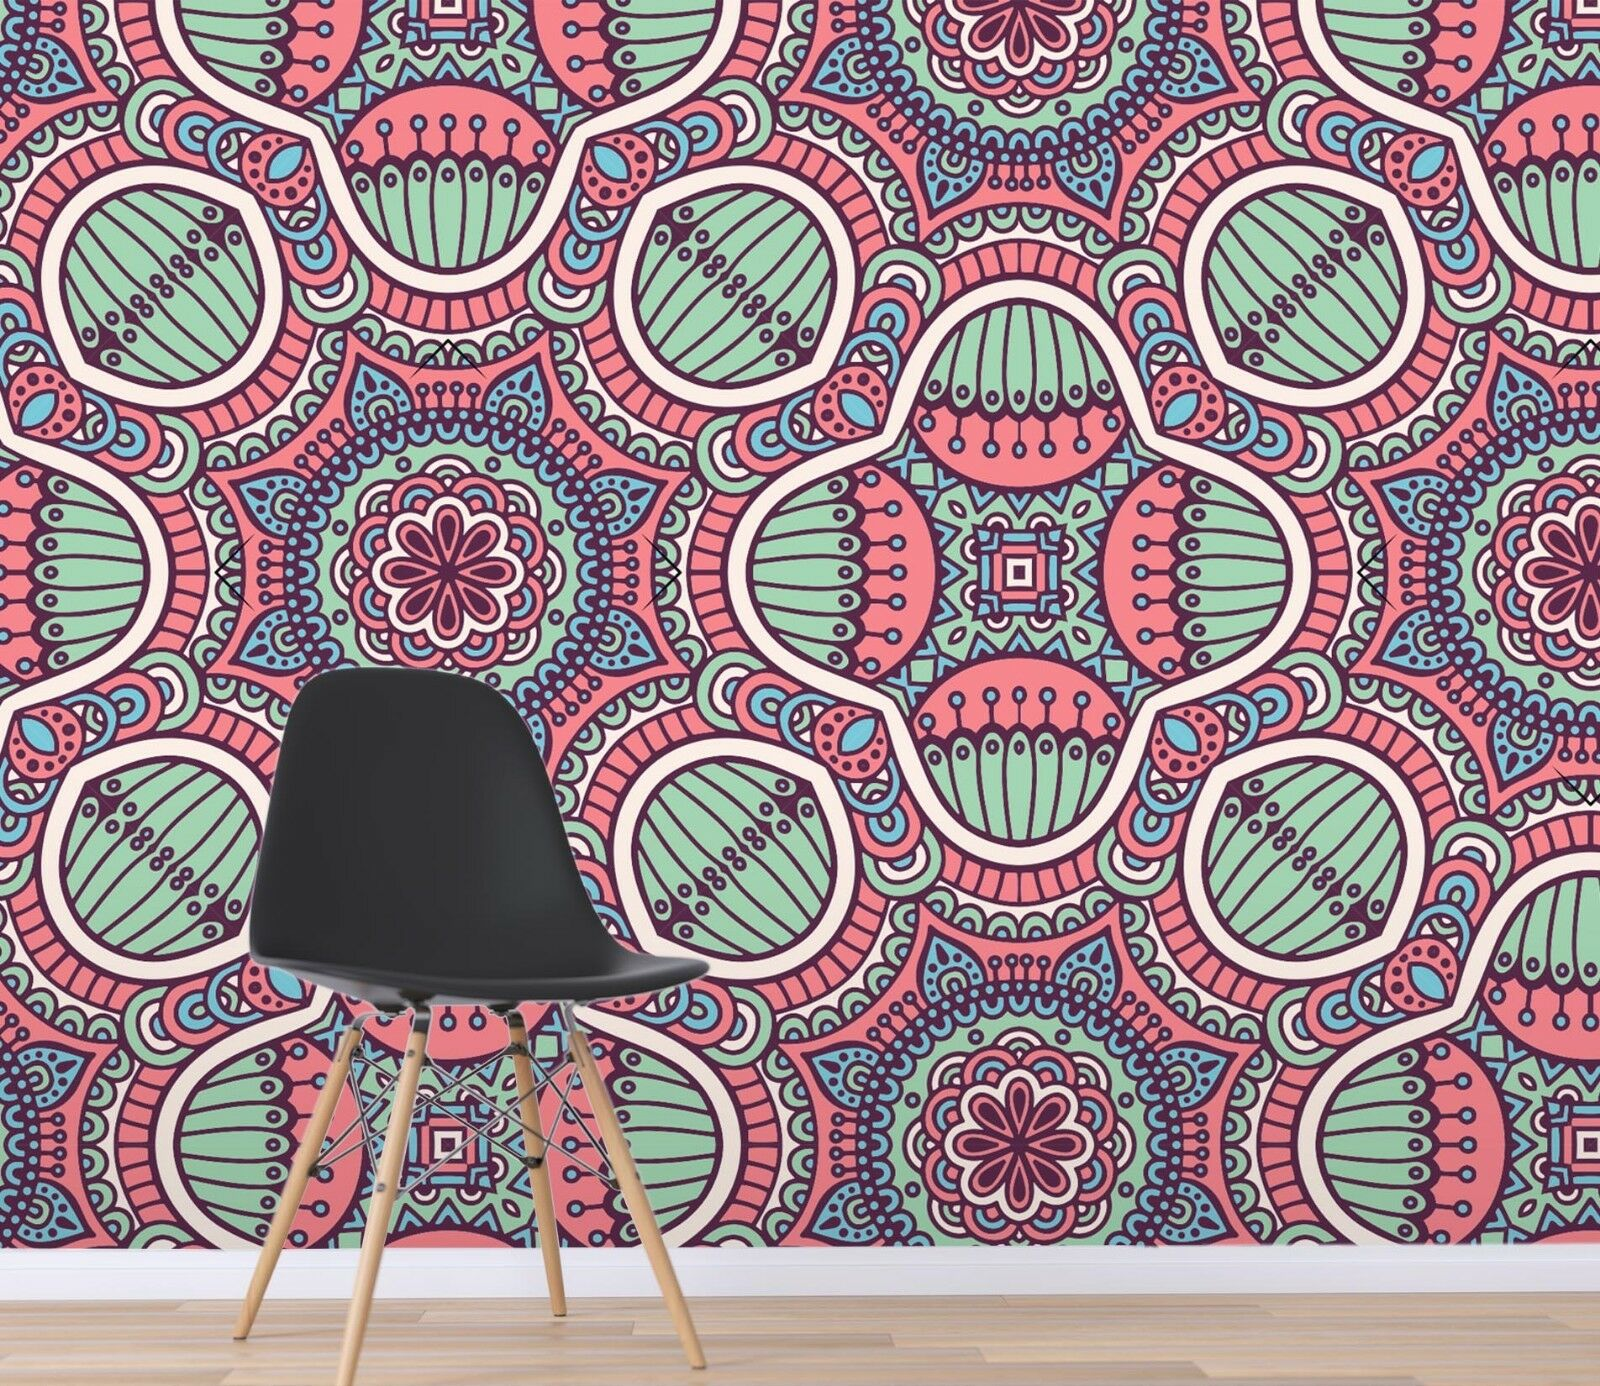 3D Floral Texture Art 11 Wallpaper Mural Print Wall Indoor Wallpaper Murals UK